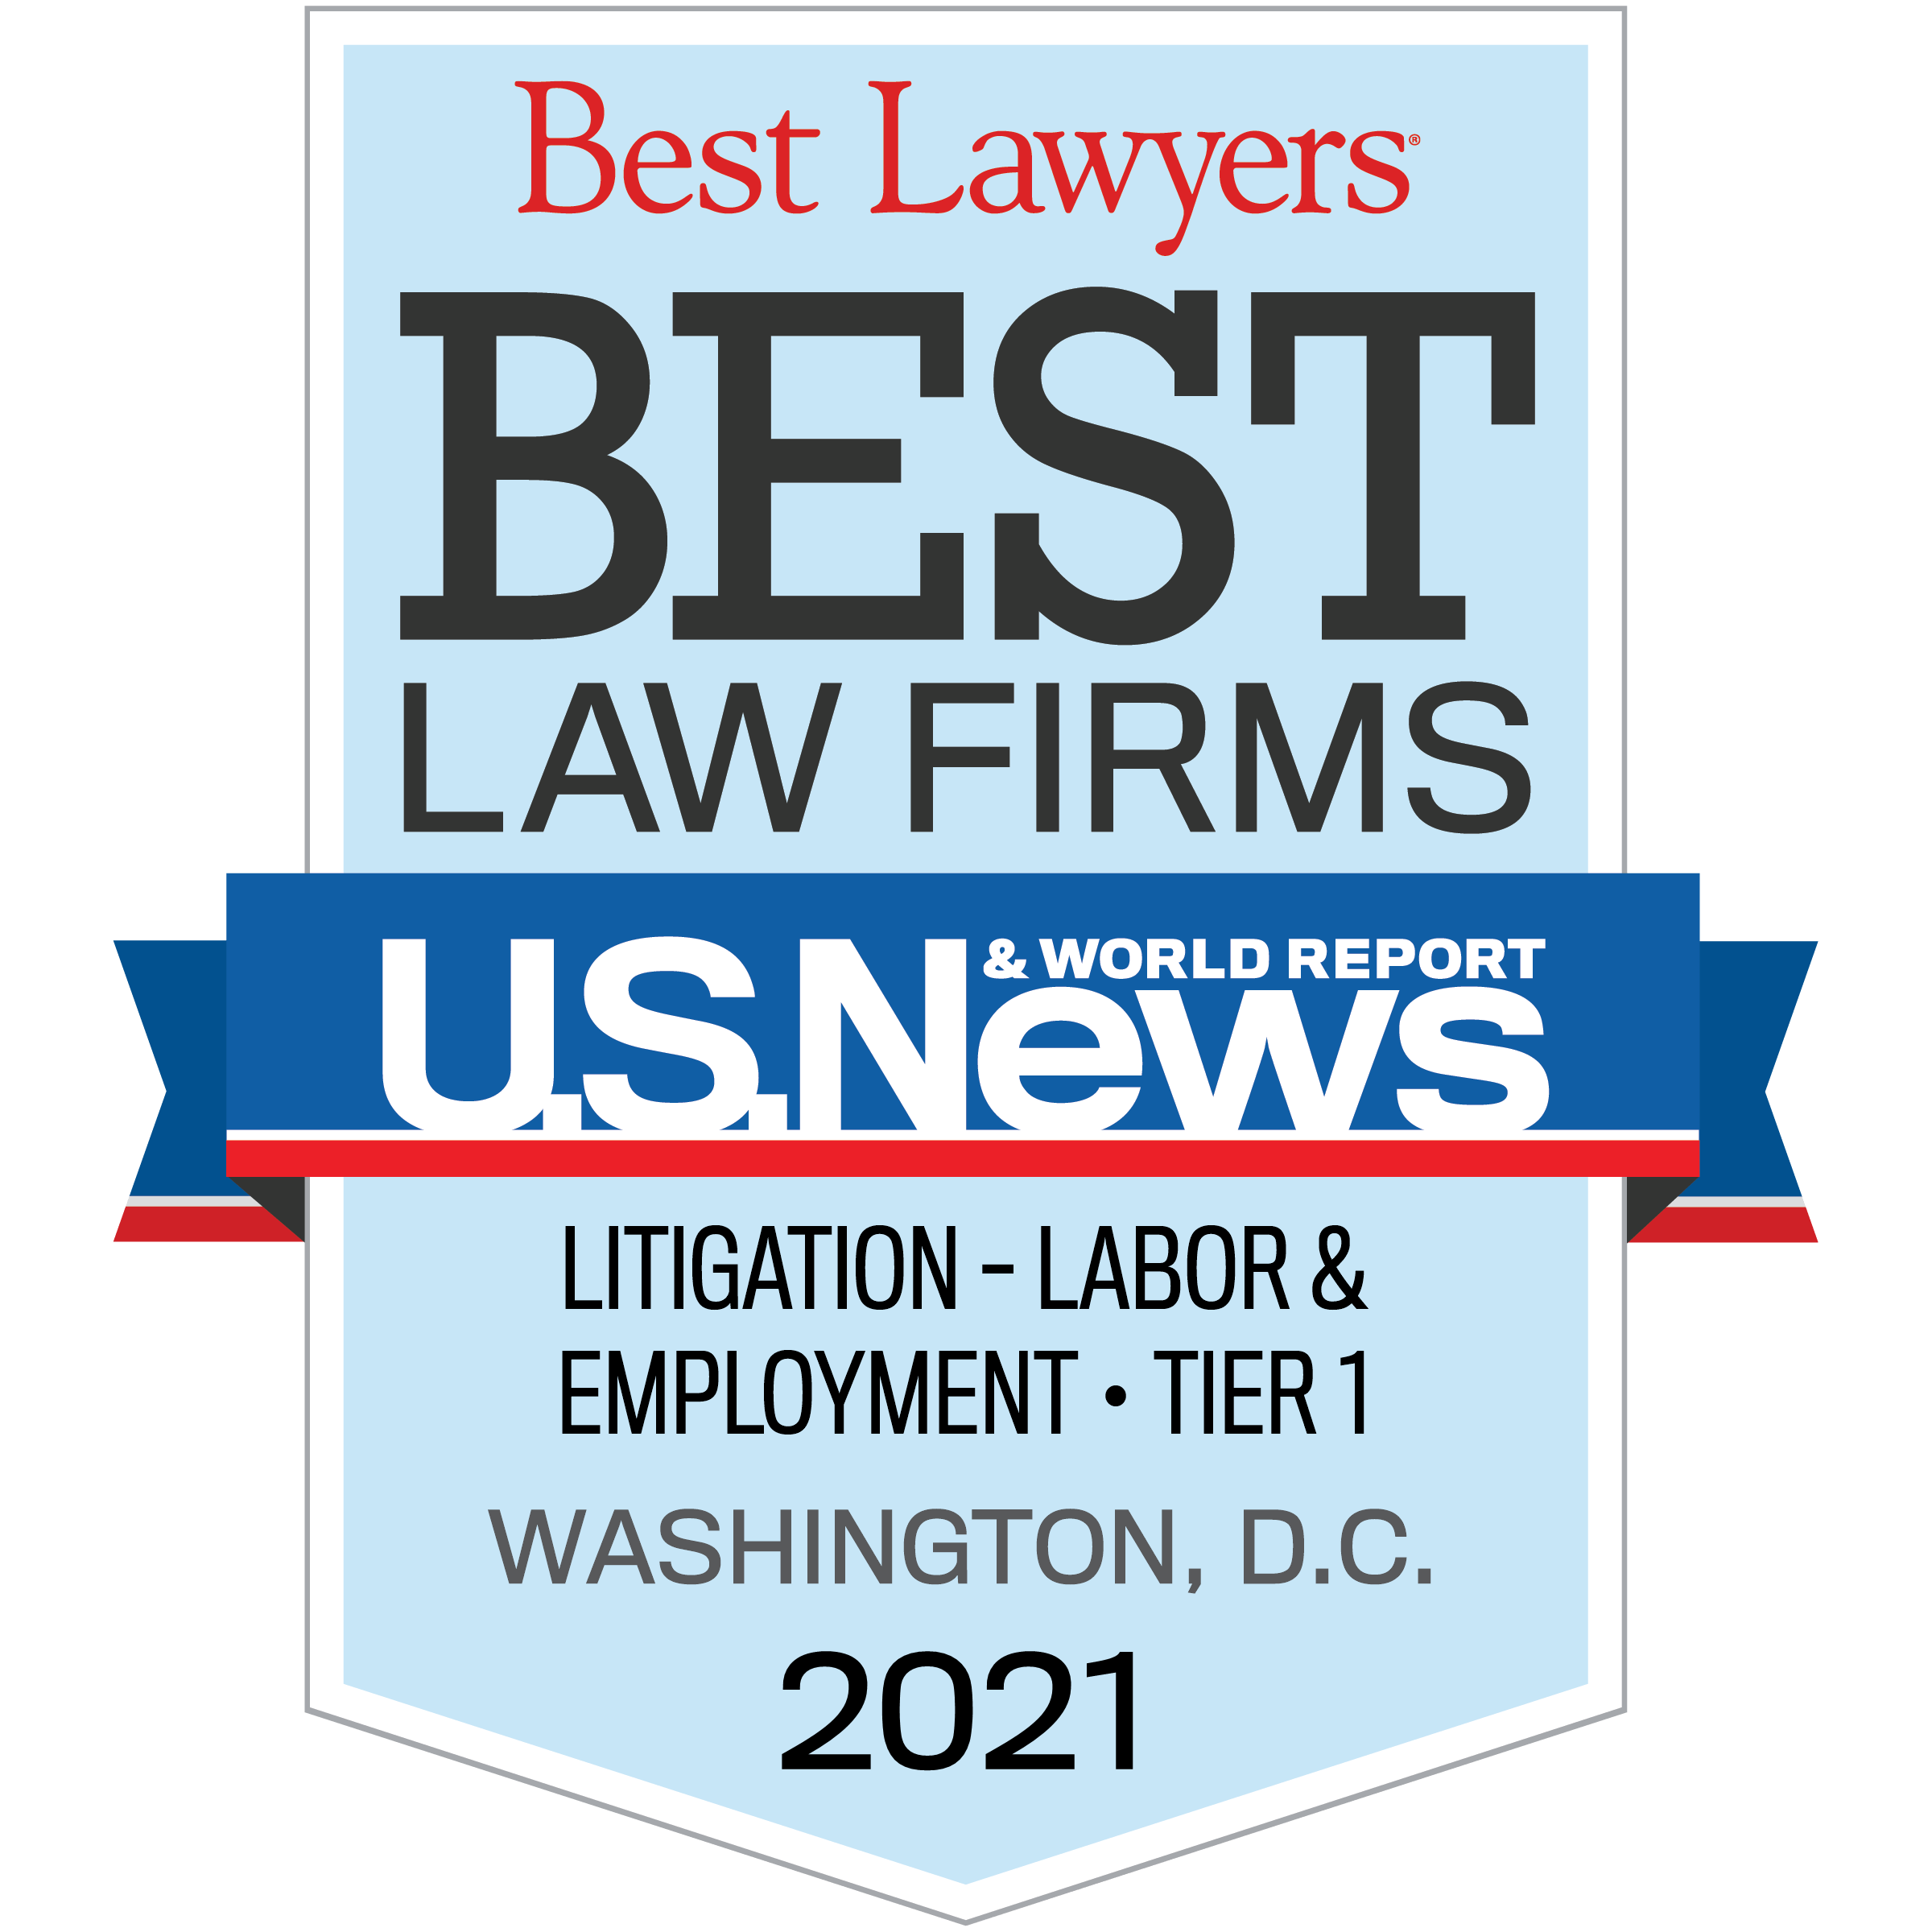 SEC Whistleblower Program Lawyers